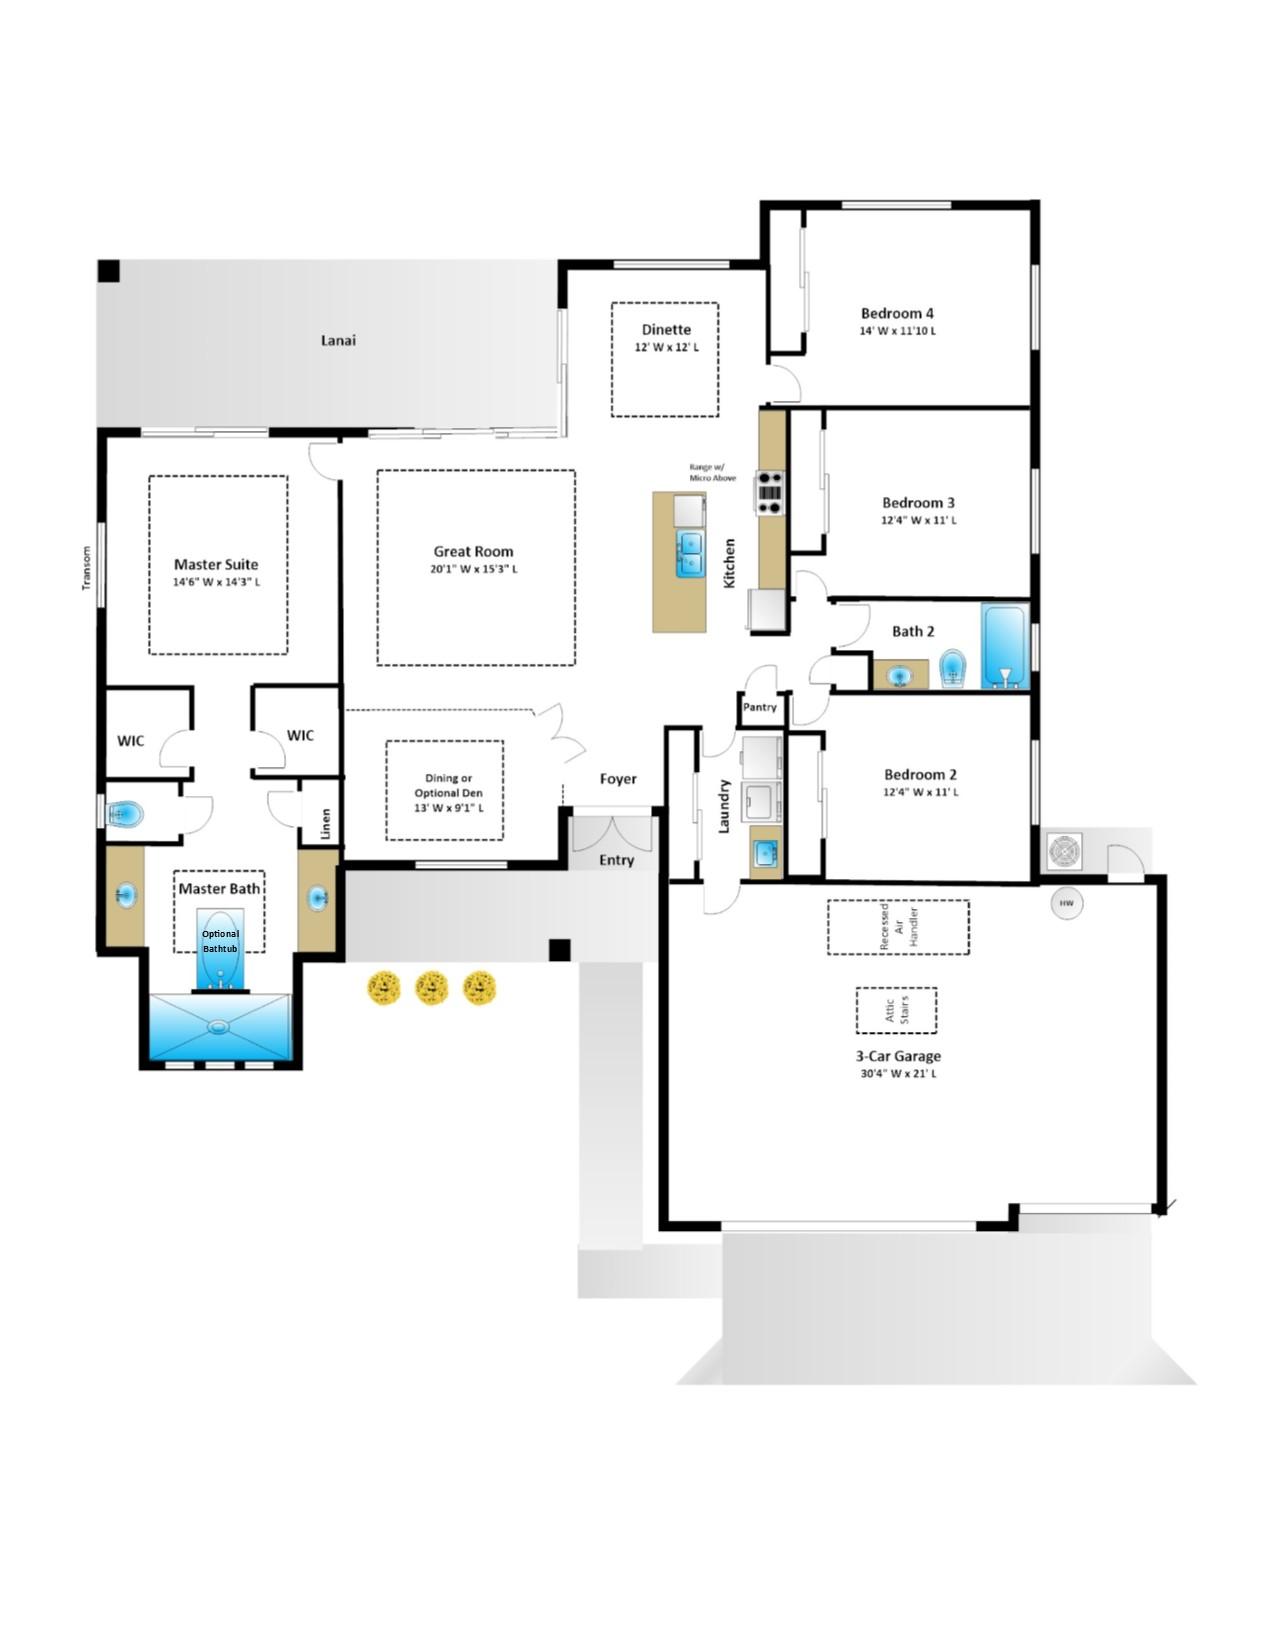 Jacaranda – 4 Bedroom 2 Bath 3 Car Garage